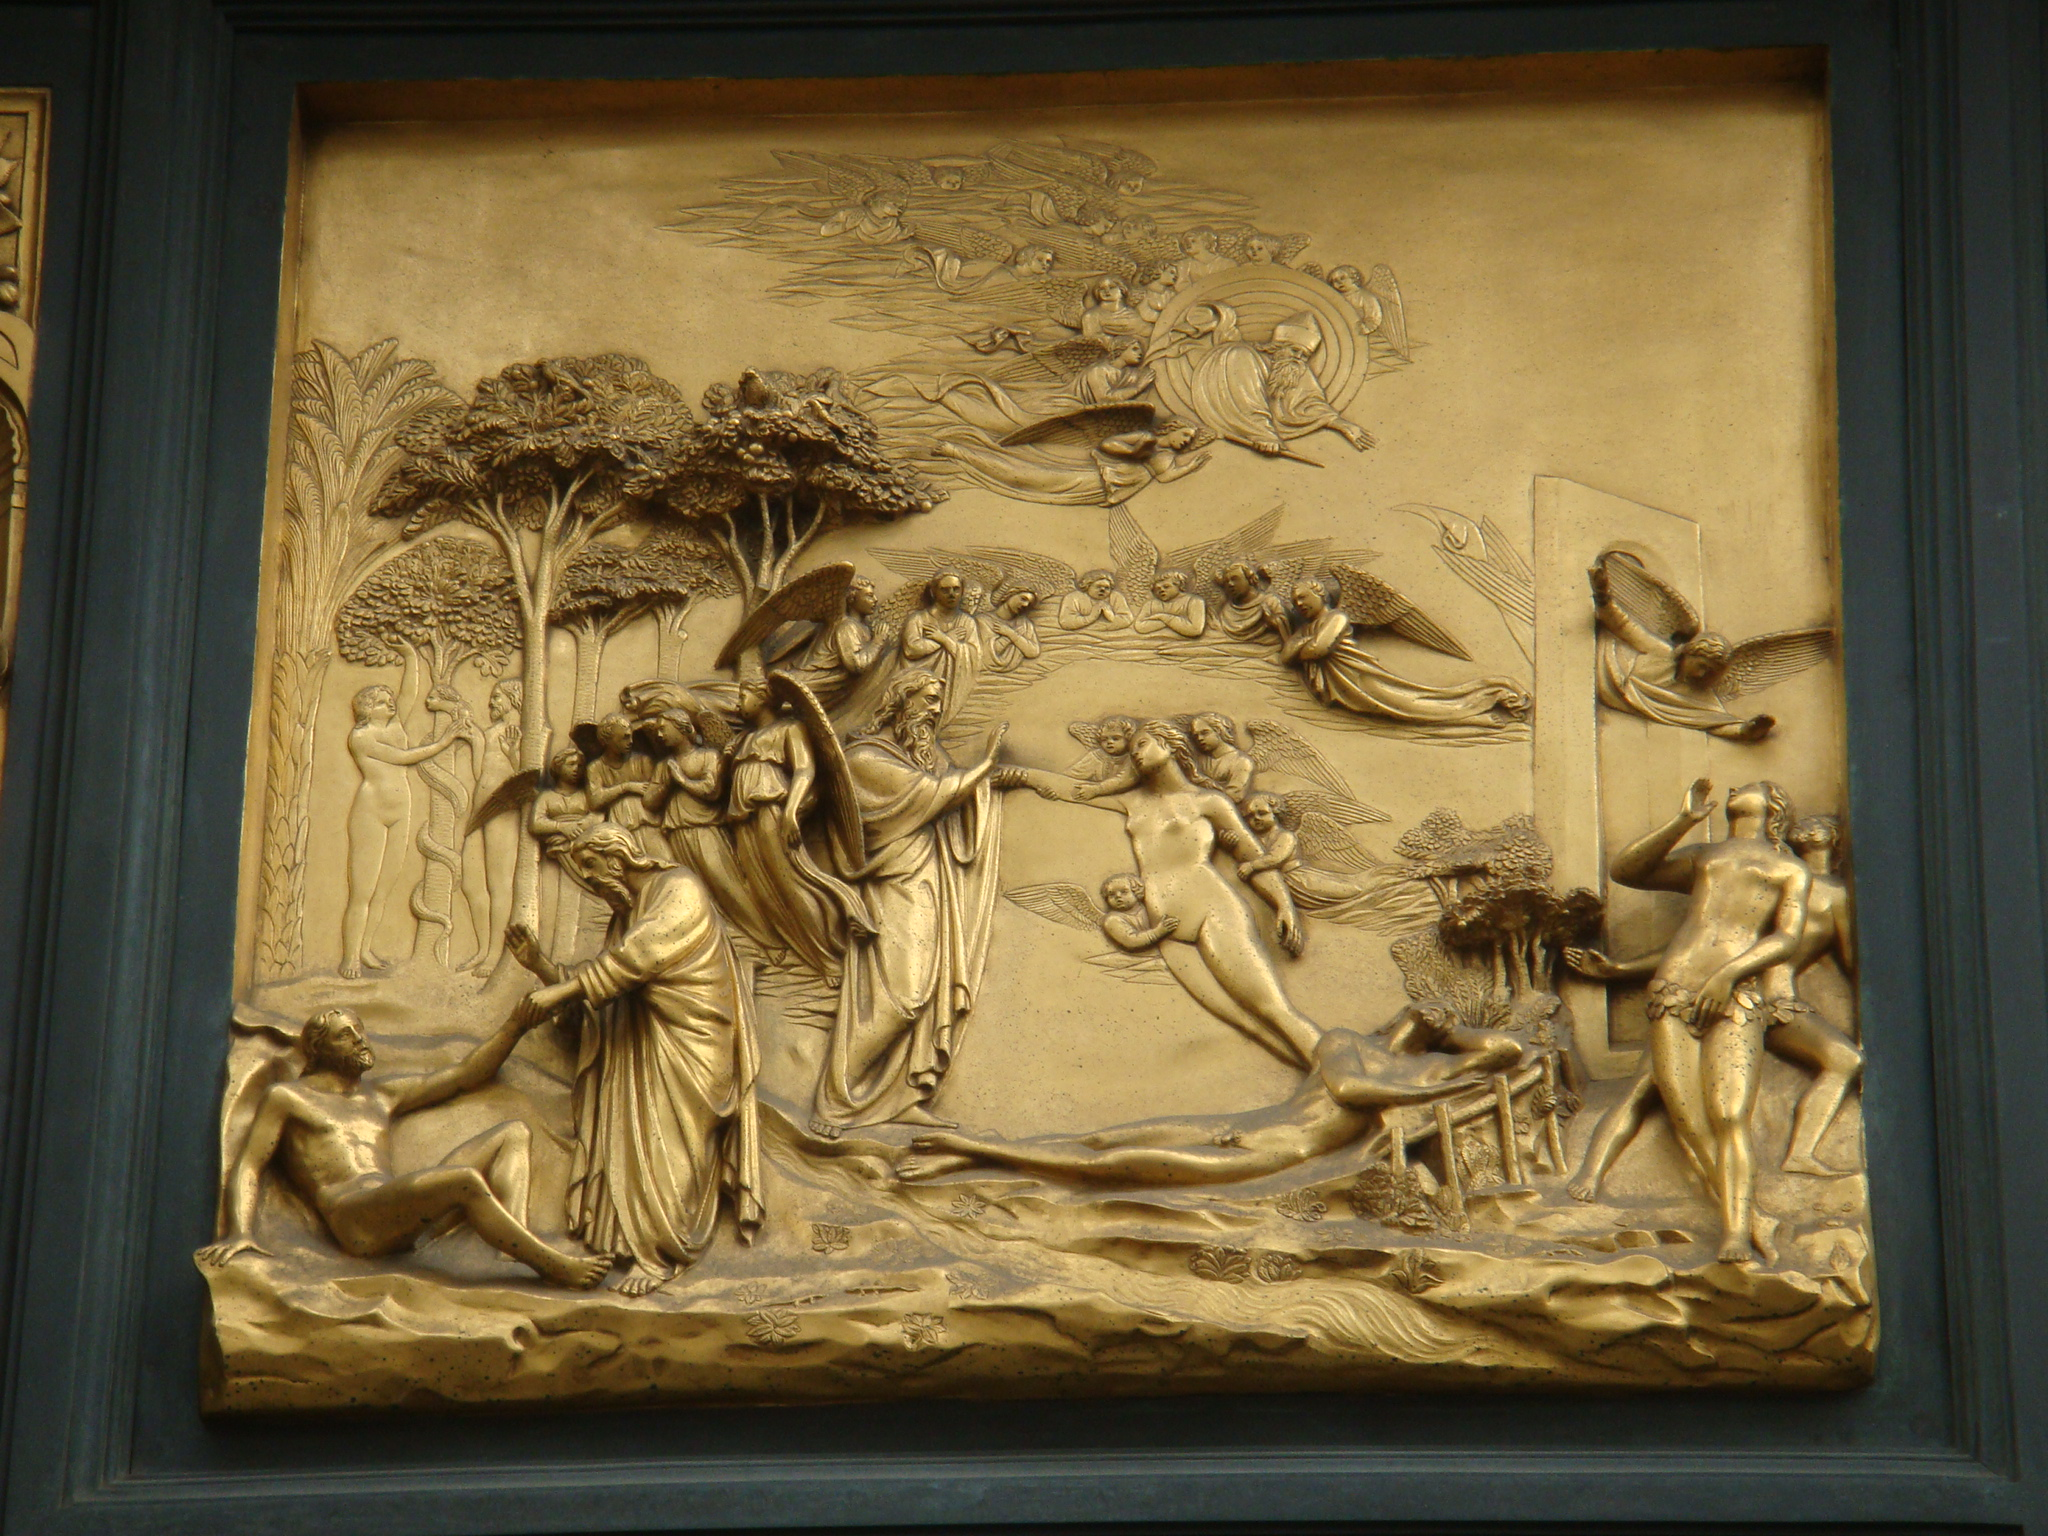 Ghibertiu0027s Gates of Paradise at the Baptistry in Florence Italy & Ghibertiu0027s Gates of Paradise: Florence Art History 101 | Vino Con ...